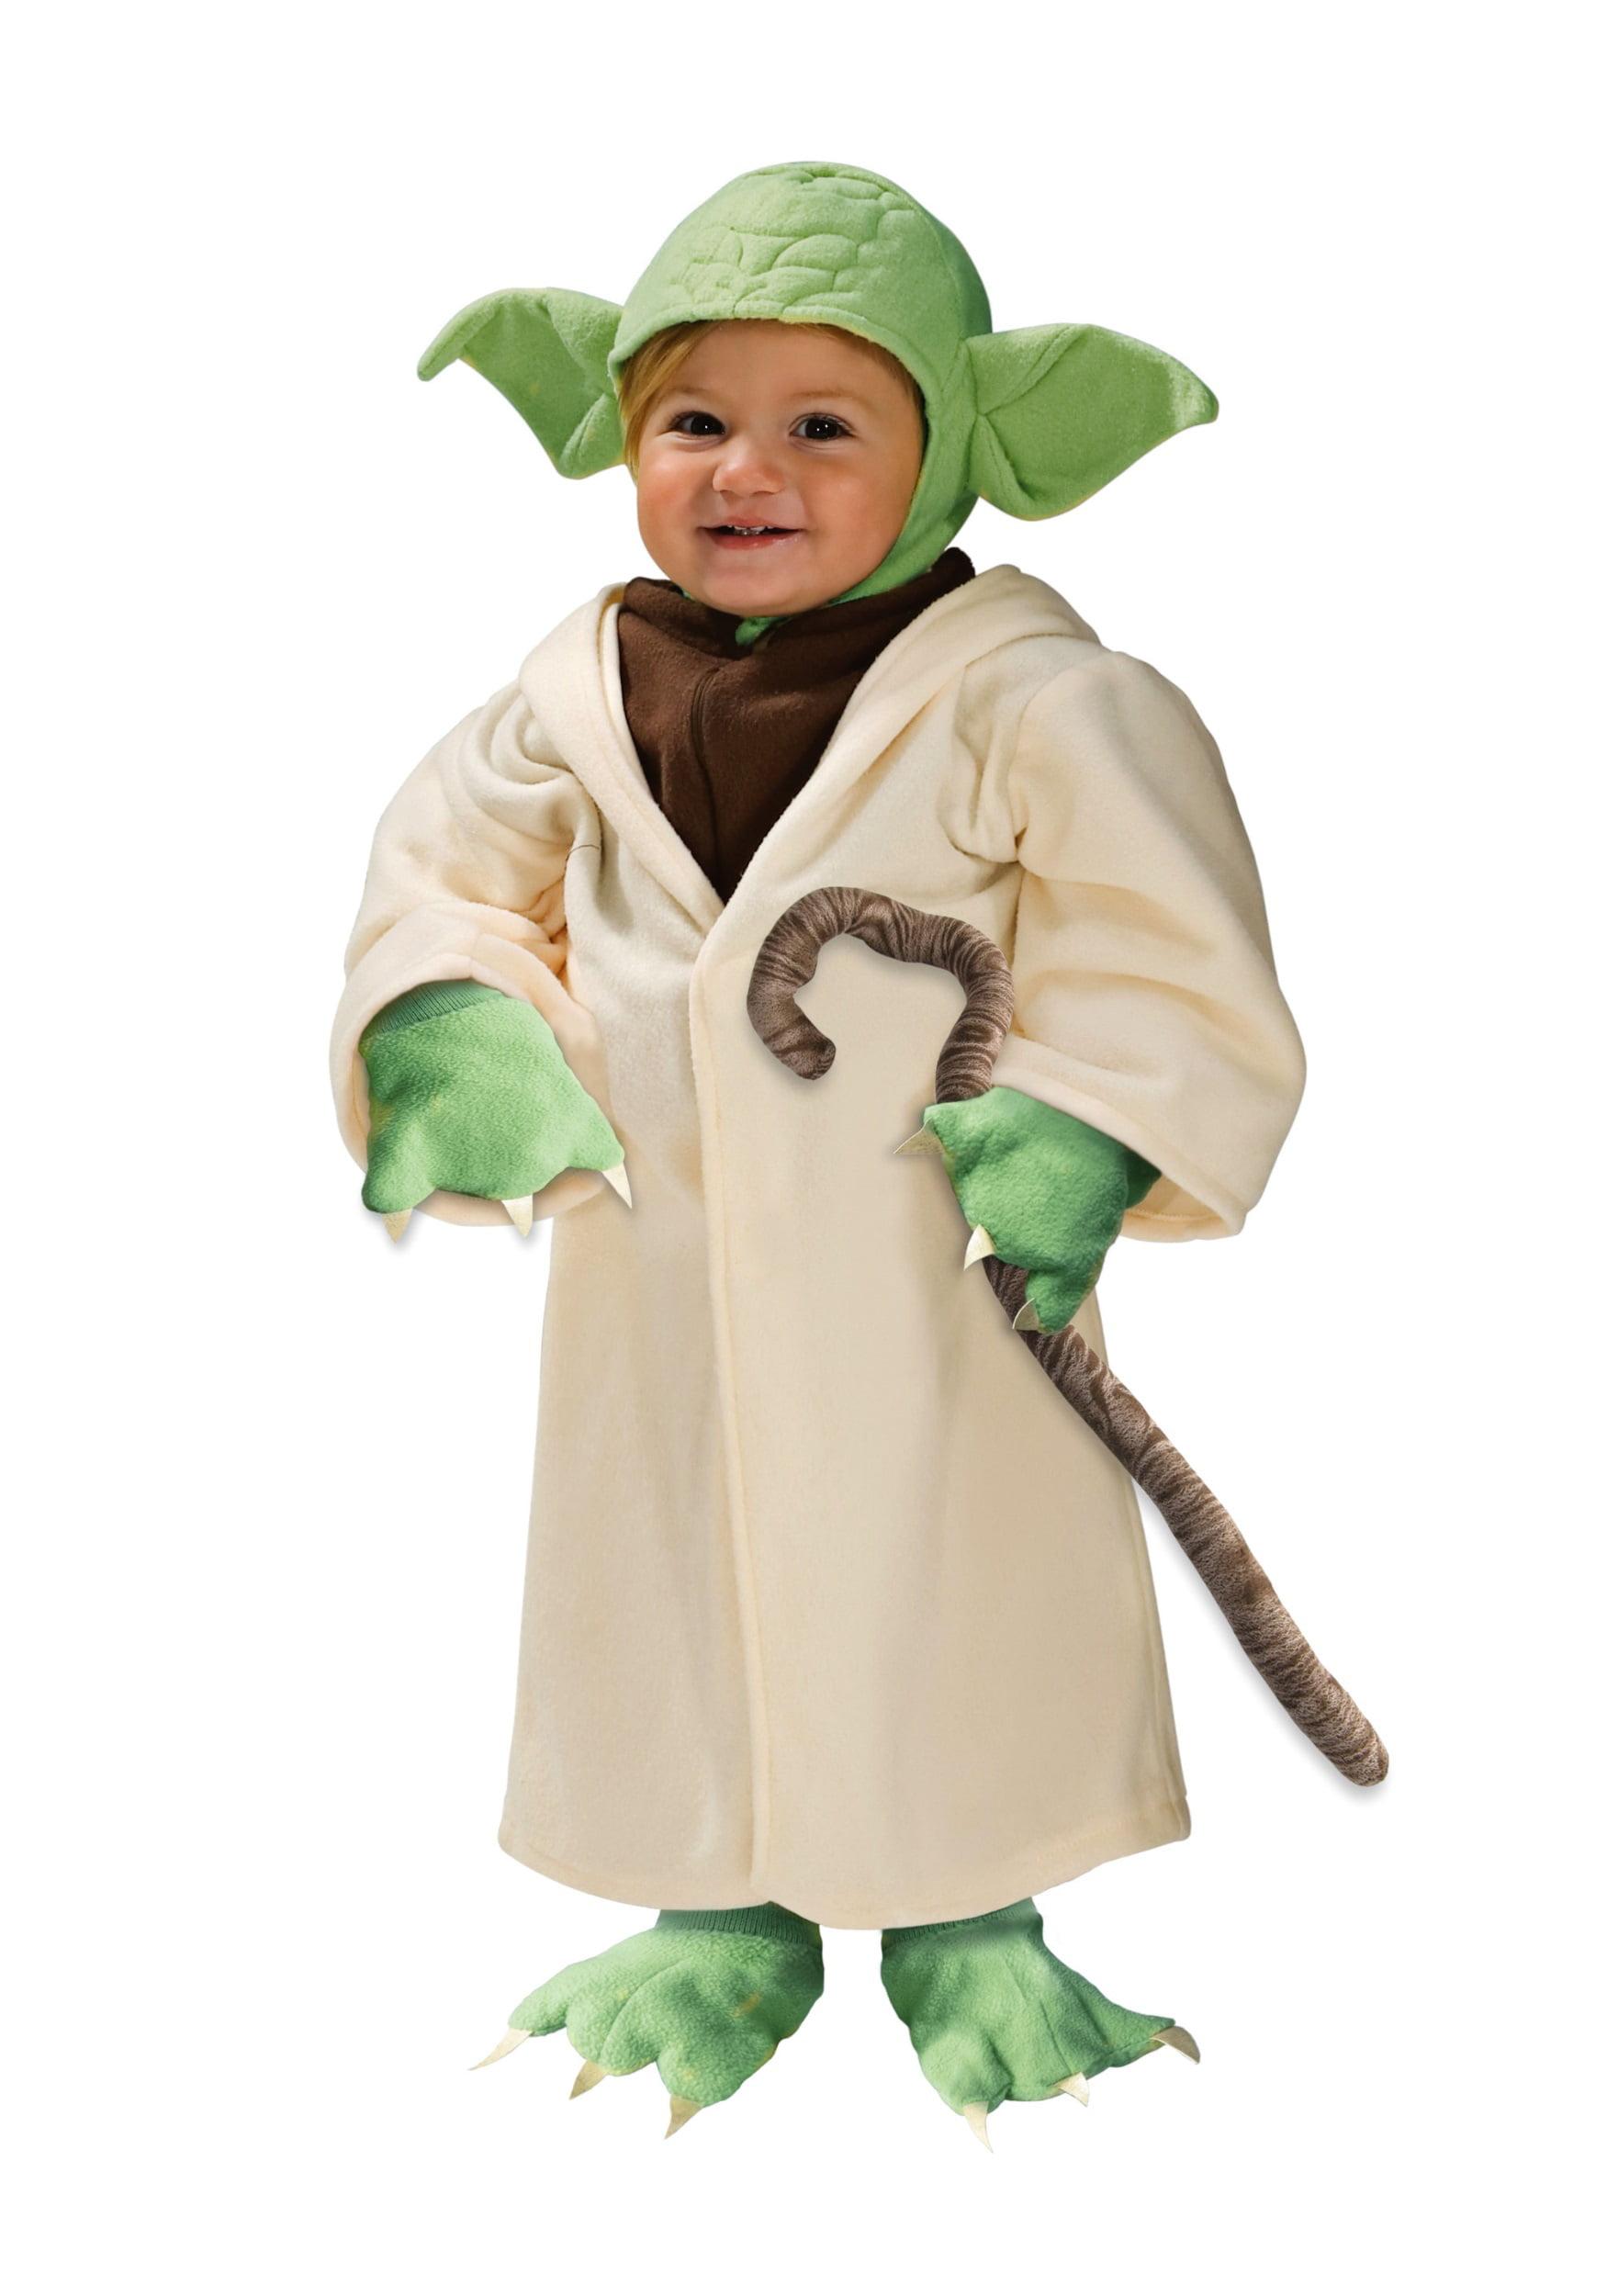 Rubie/'s Star Wars Yoda  Halloween Costume Infant Baby Boy Size 24 Months NEW